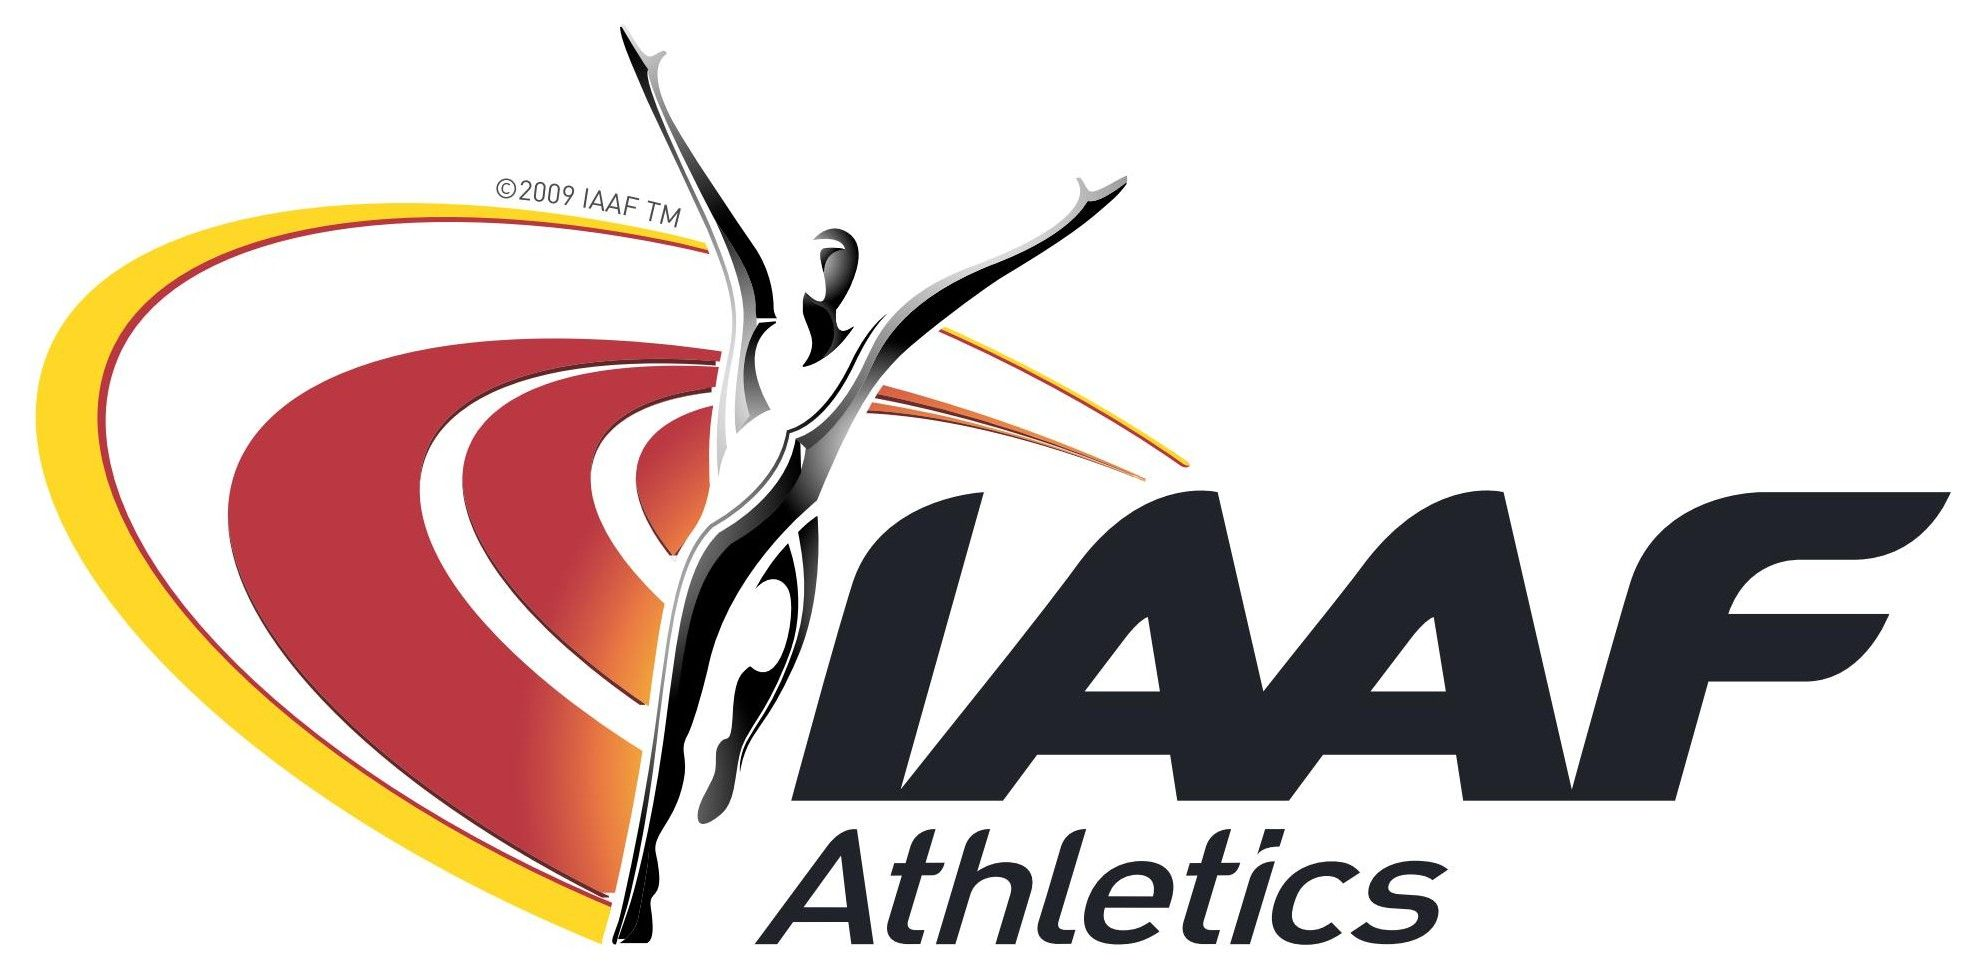 International Association of Athletics Federations (IAAF